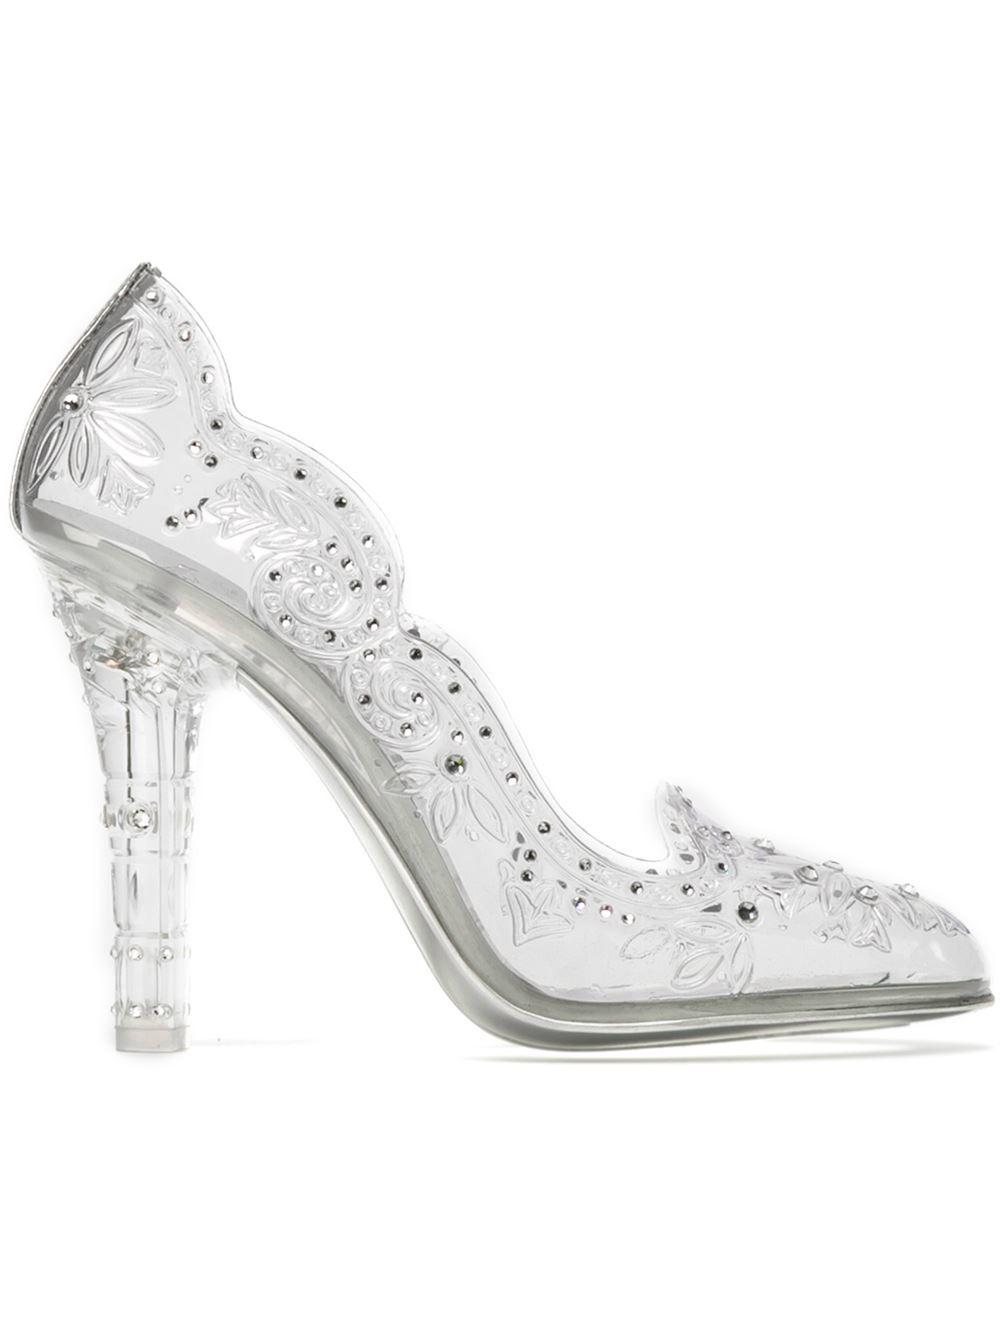 Dolce \u0026 Gabbana Embellished Clear Pumps